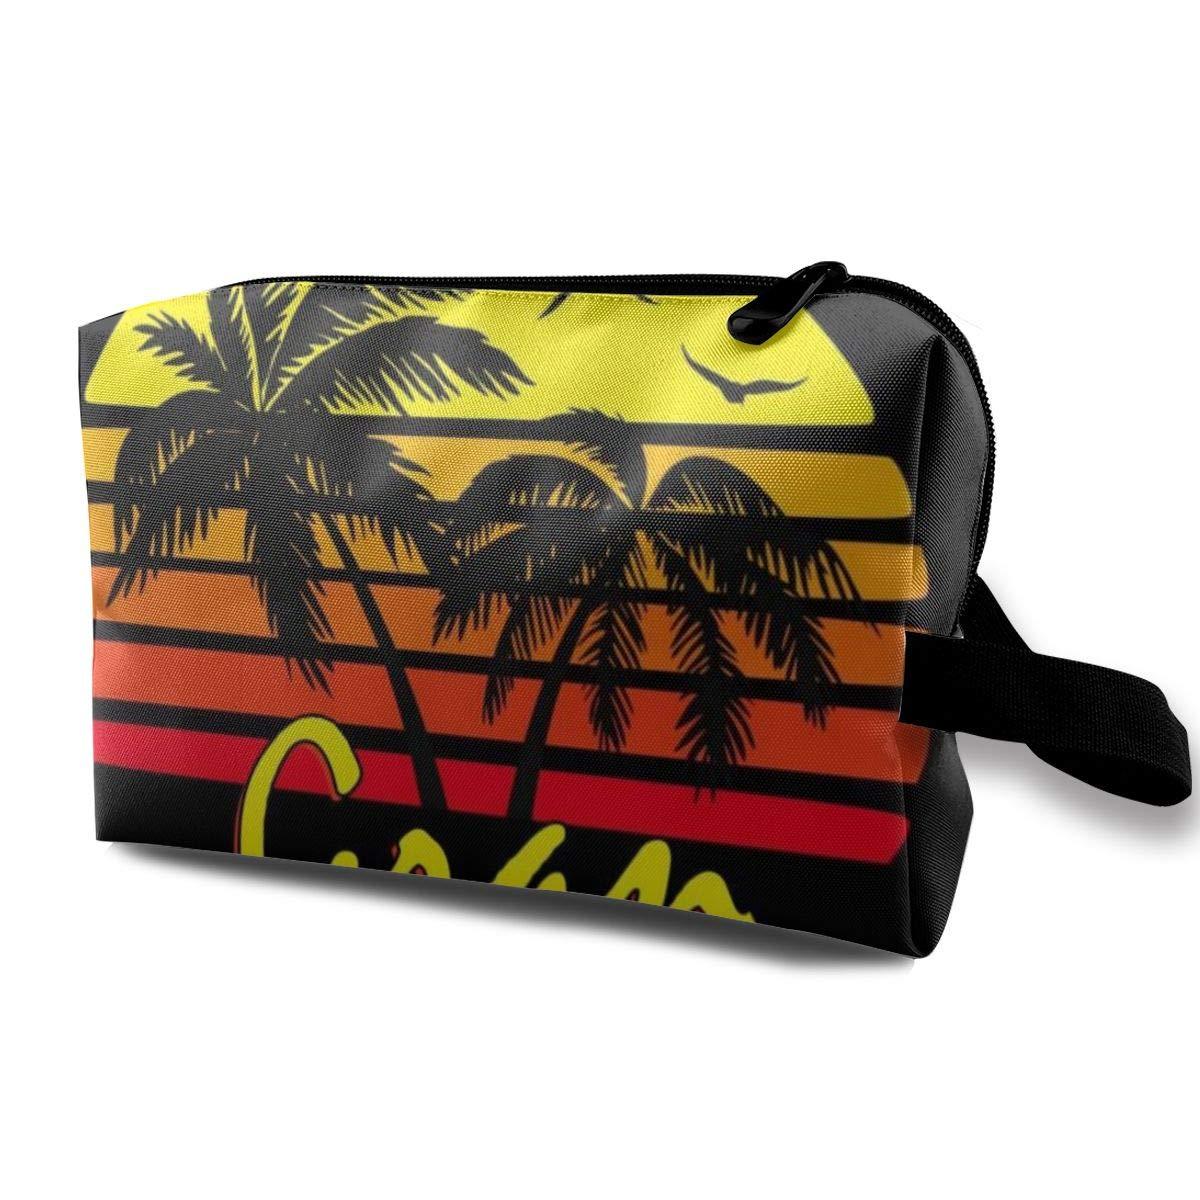 Makeup Bag Cosmetic Pouch Gran Canaria Vintage Sun Multi-Functional Bag Travel Kit Storage Bag